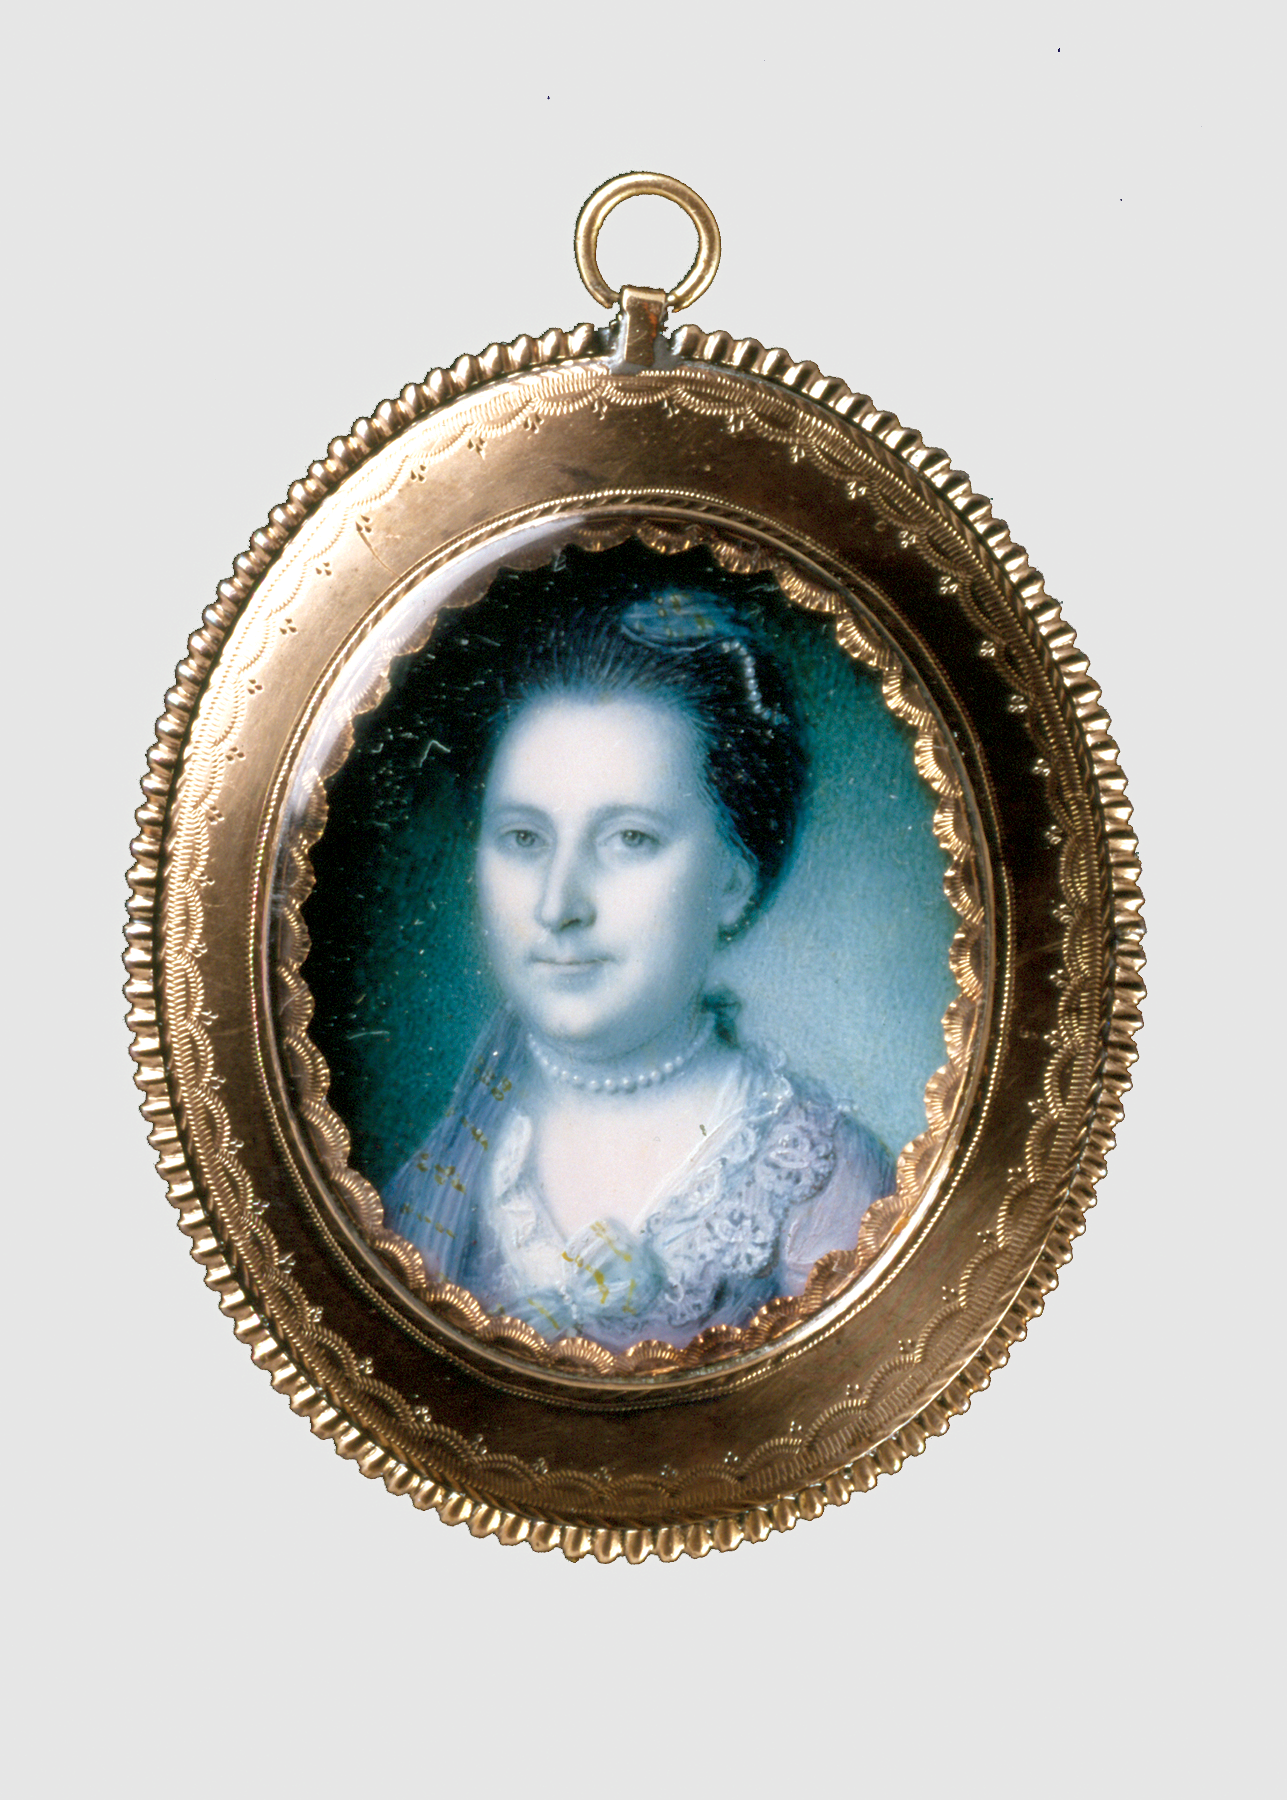 Charles Willson Peale's 1772 miniature portrait of Martha Washington.